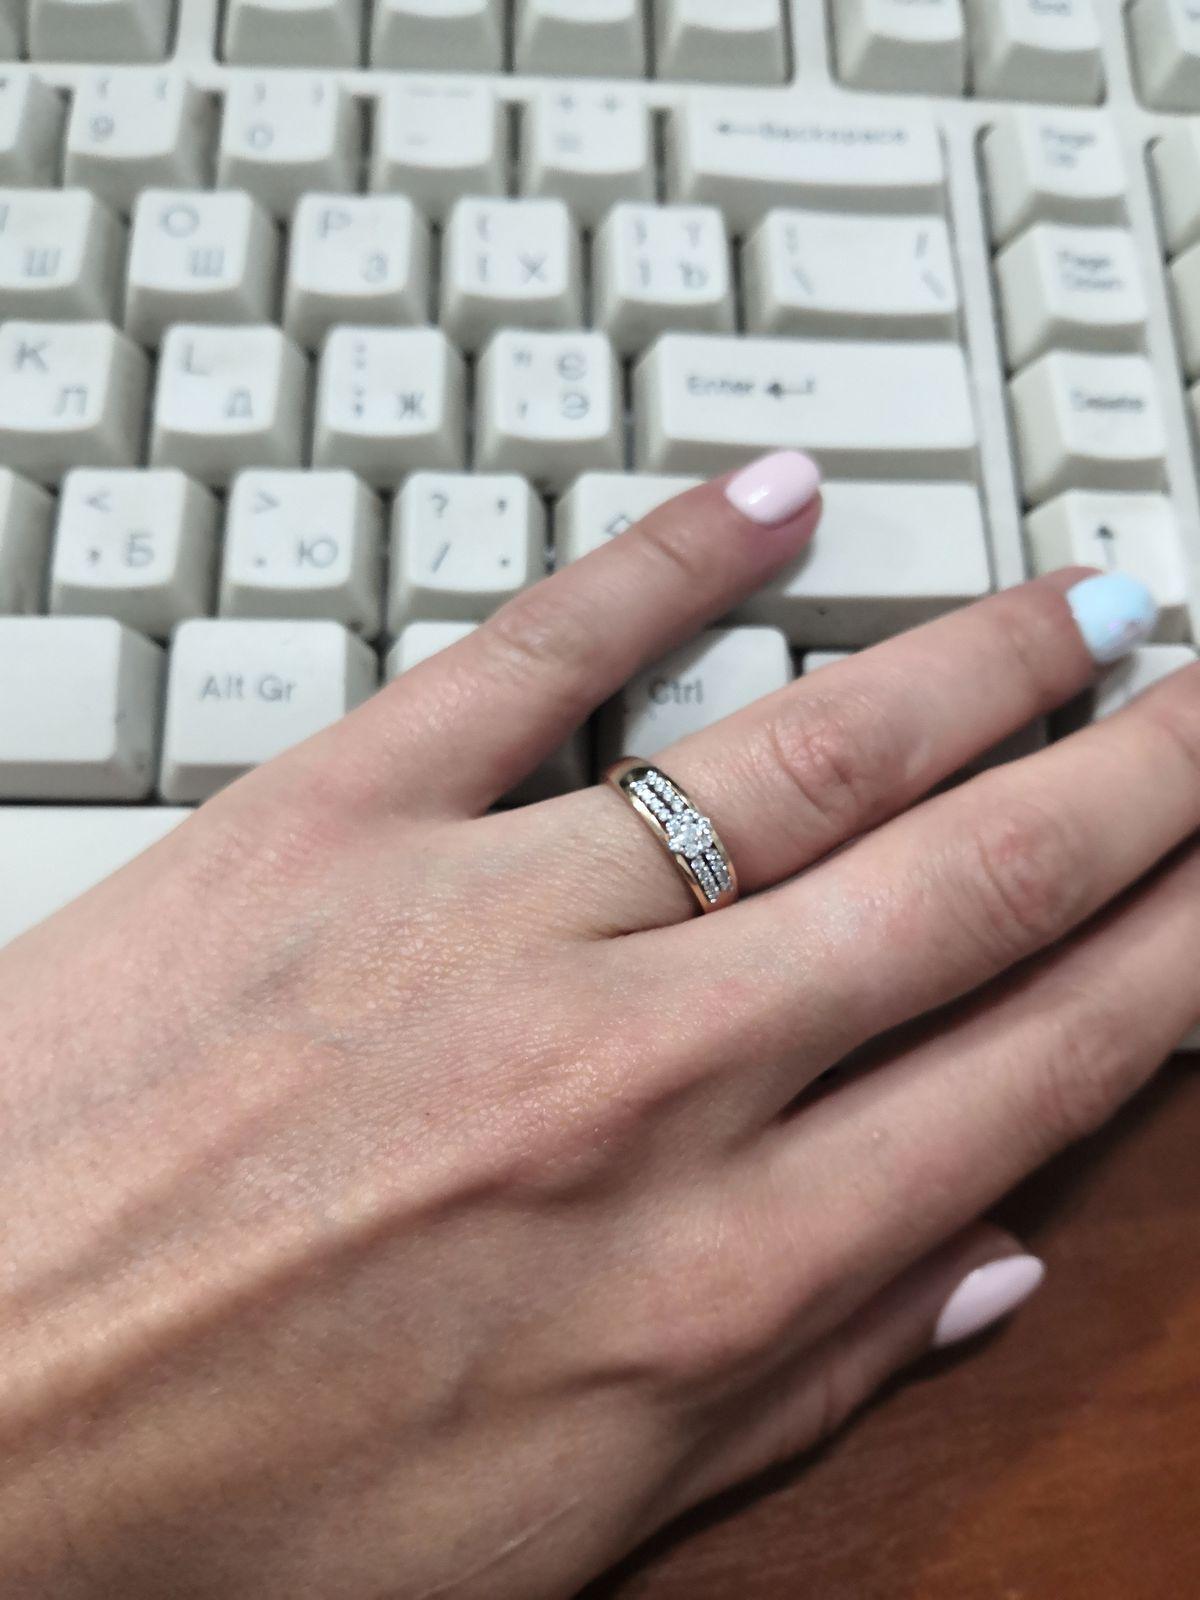 Супер кольцо. Советую